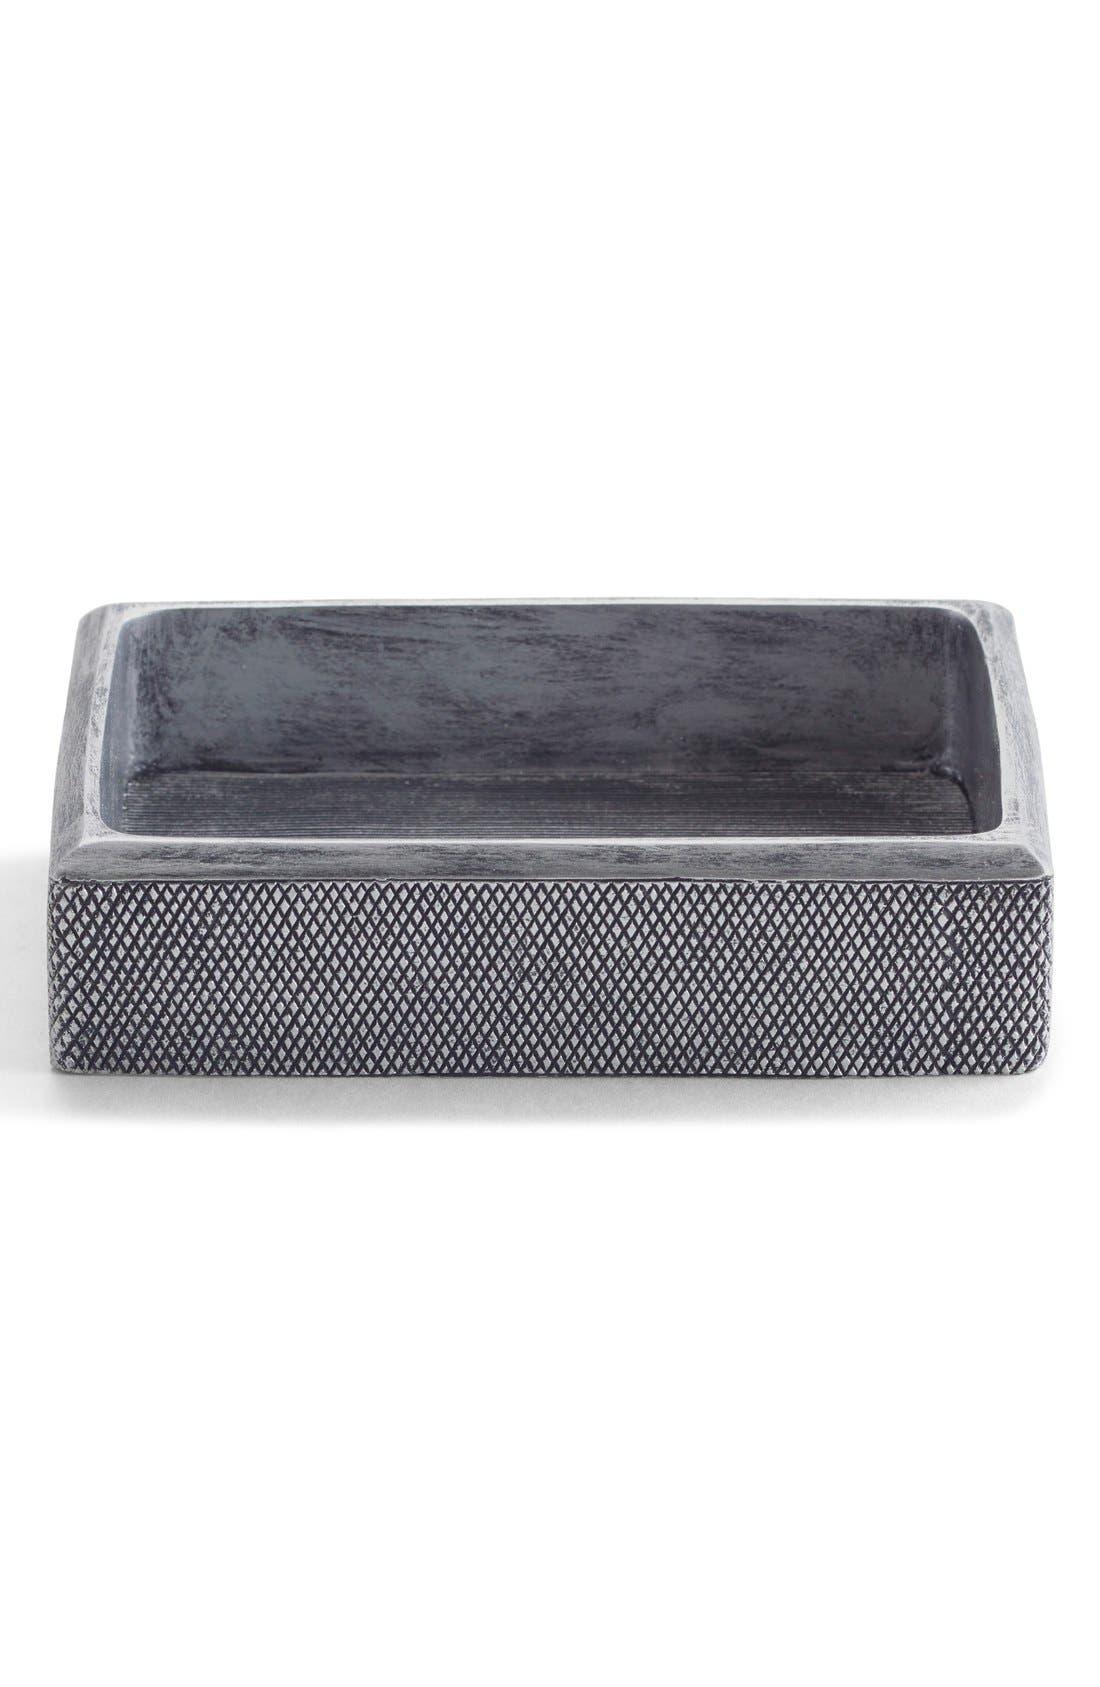 KASSATEX Etched Soap Dish